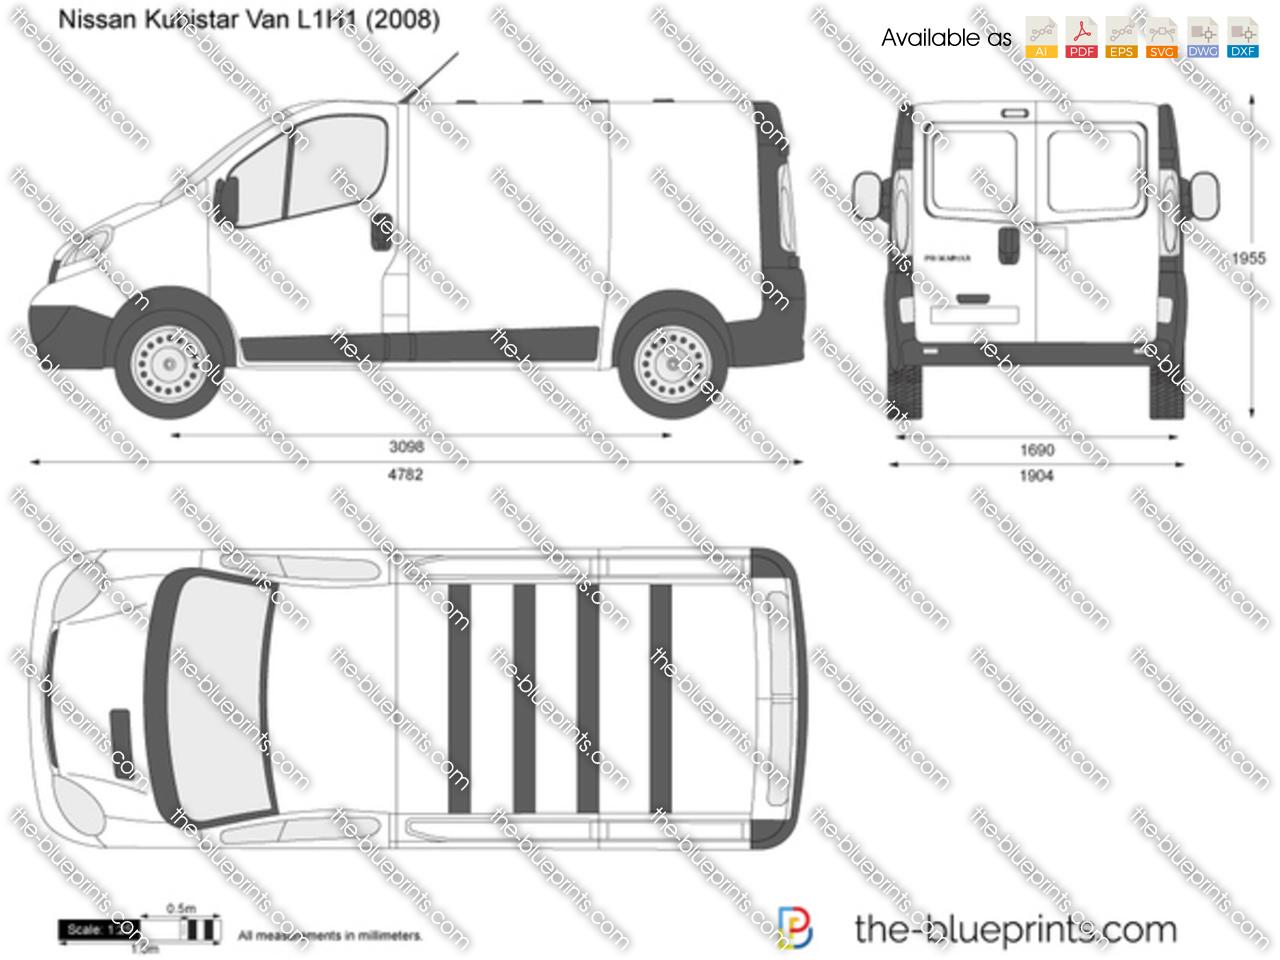 Nissan Primastar Van L1h1 Vector Drawing